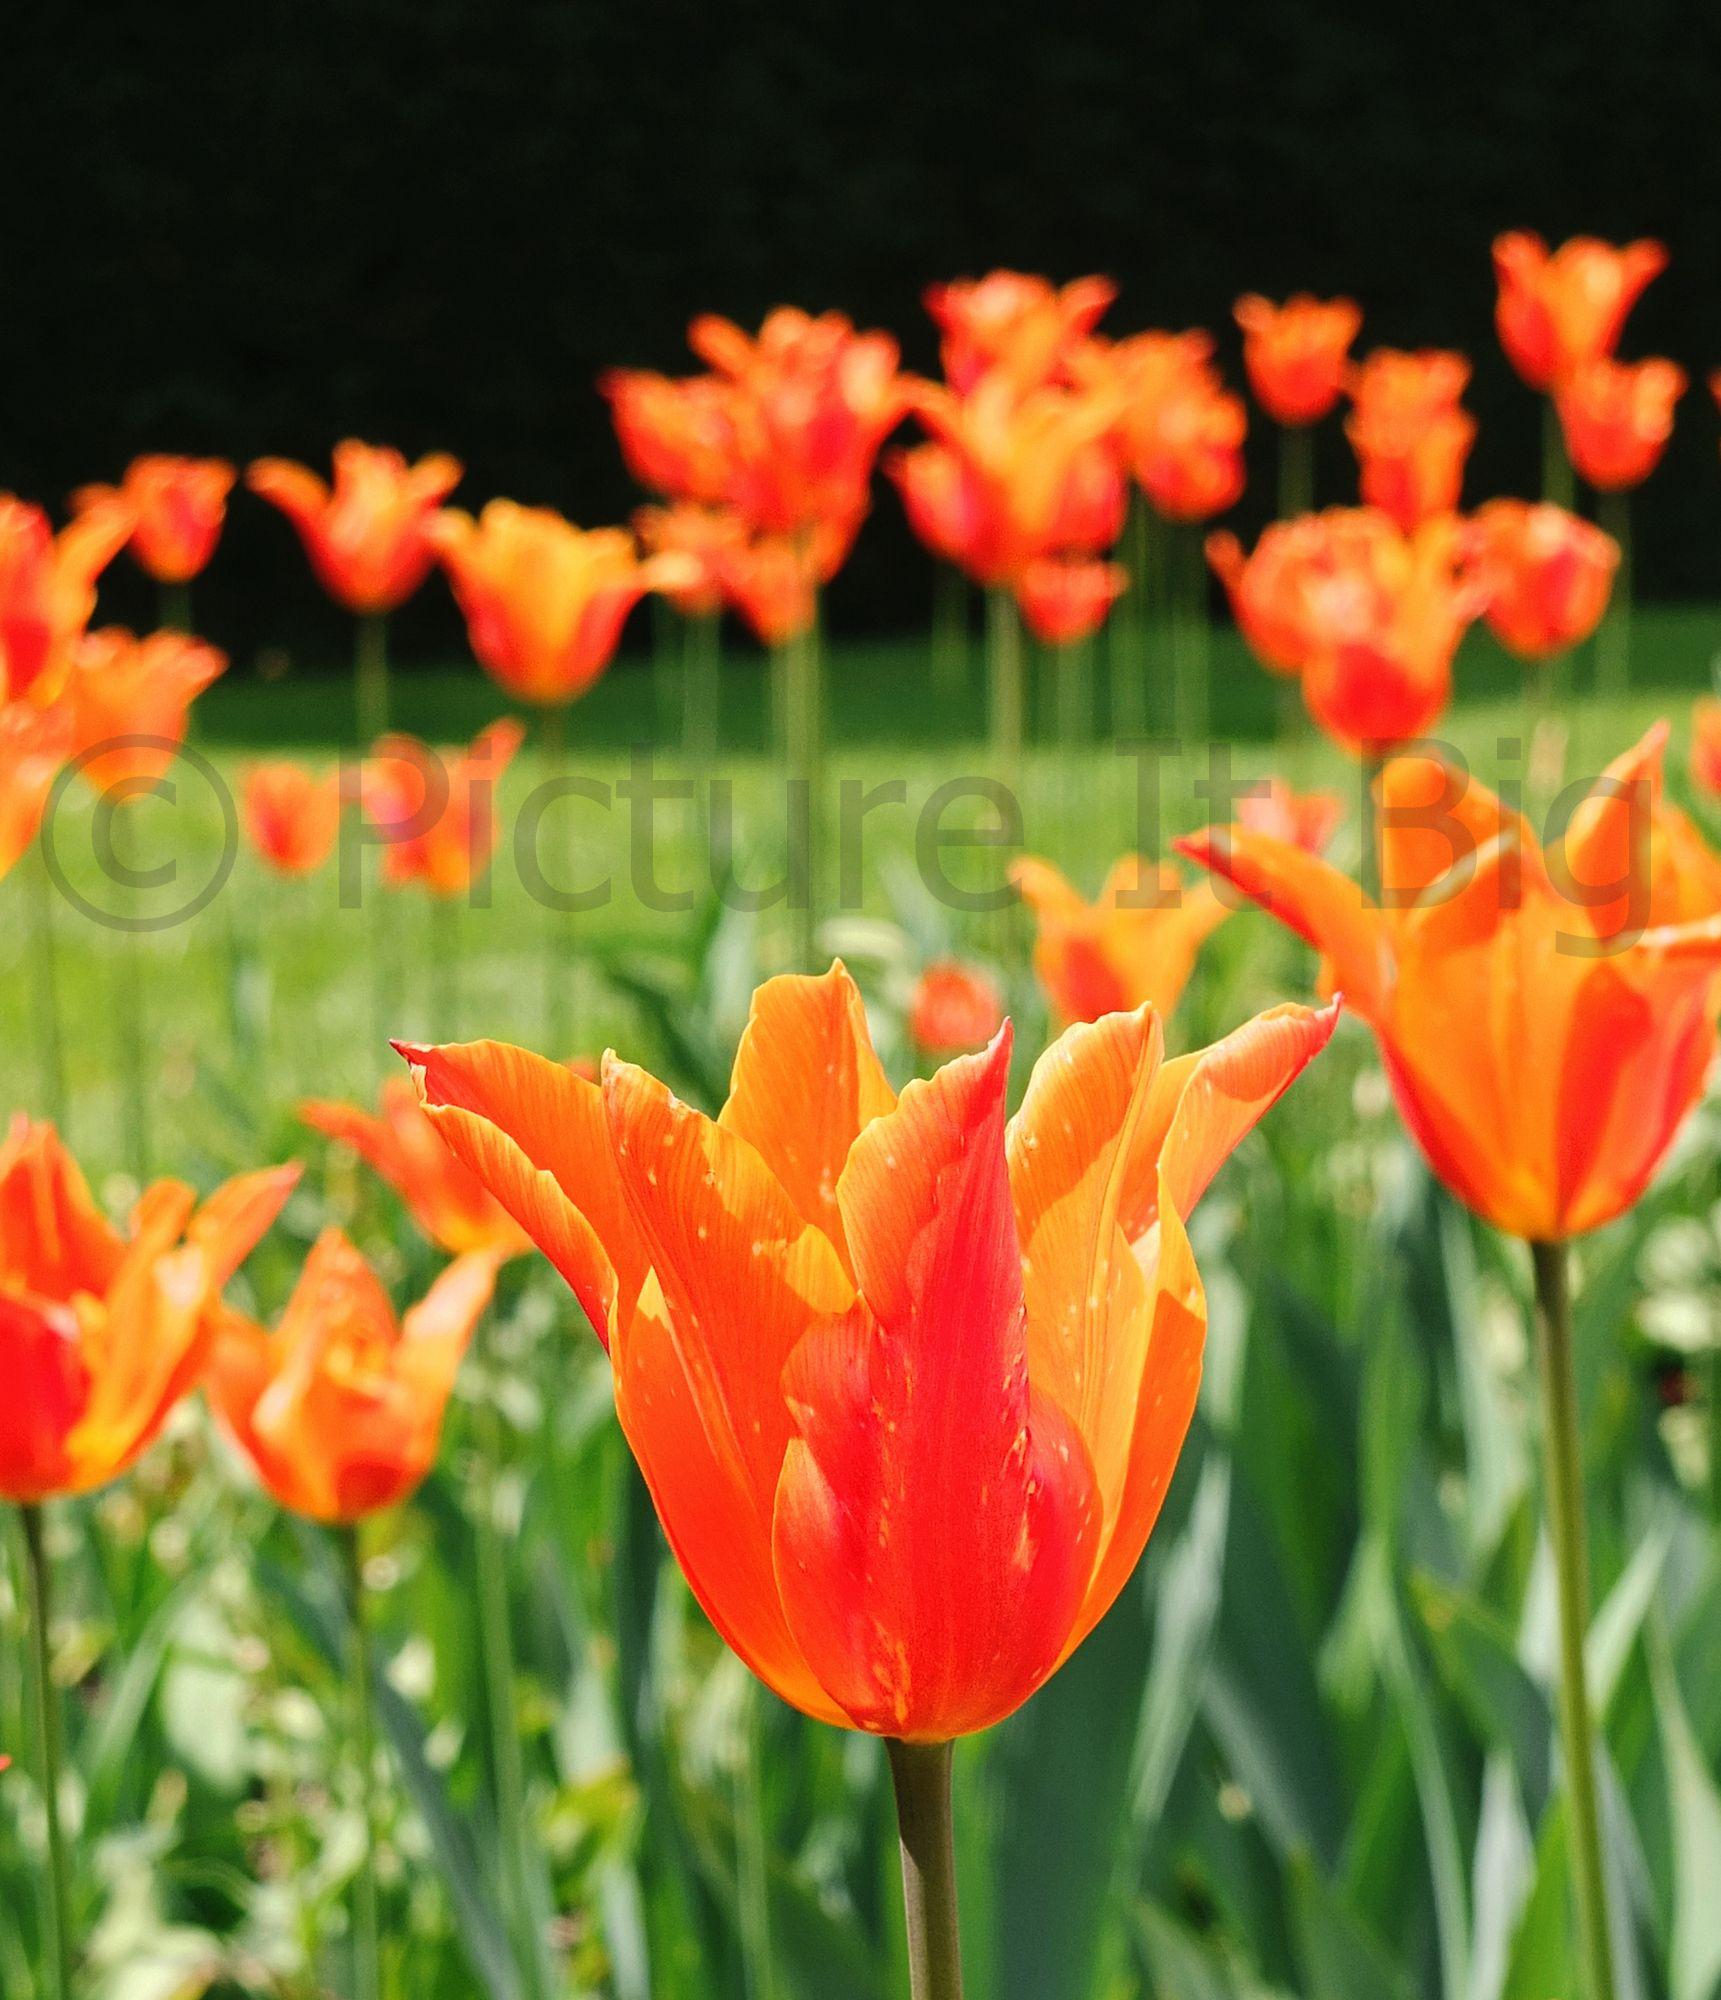 Photographed at #ArleyHallandGardens  #tulips www.picture-it-big.co.uk